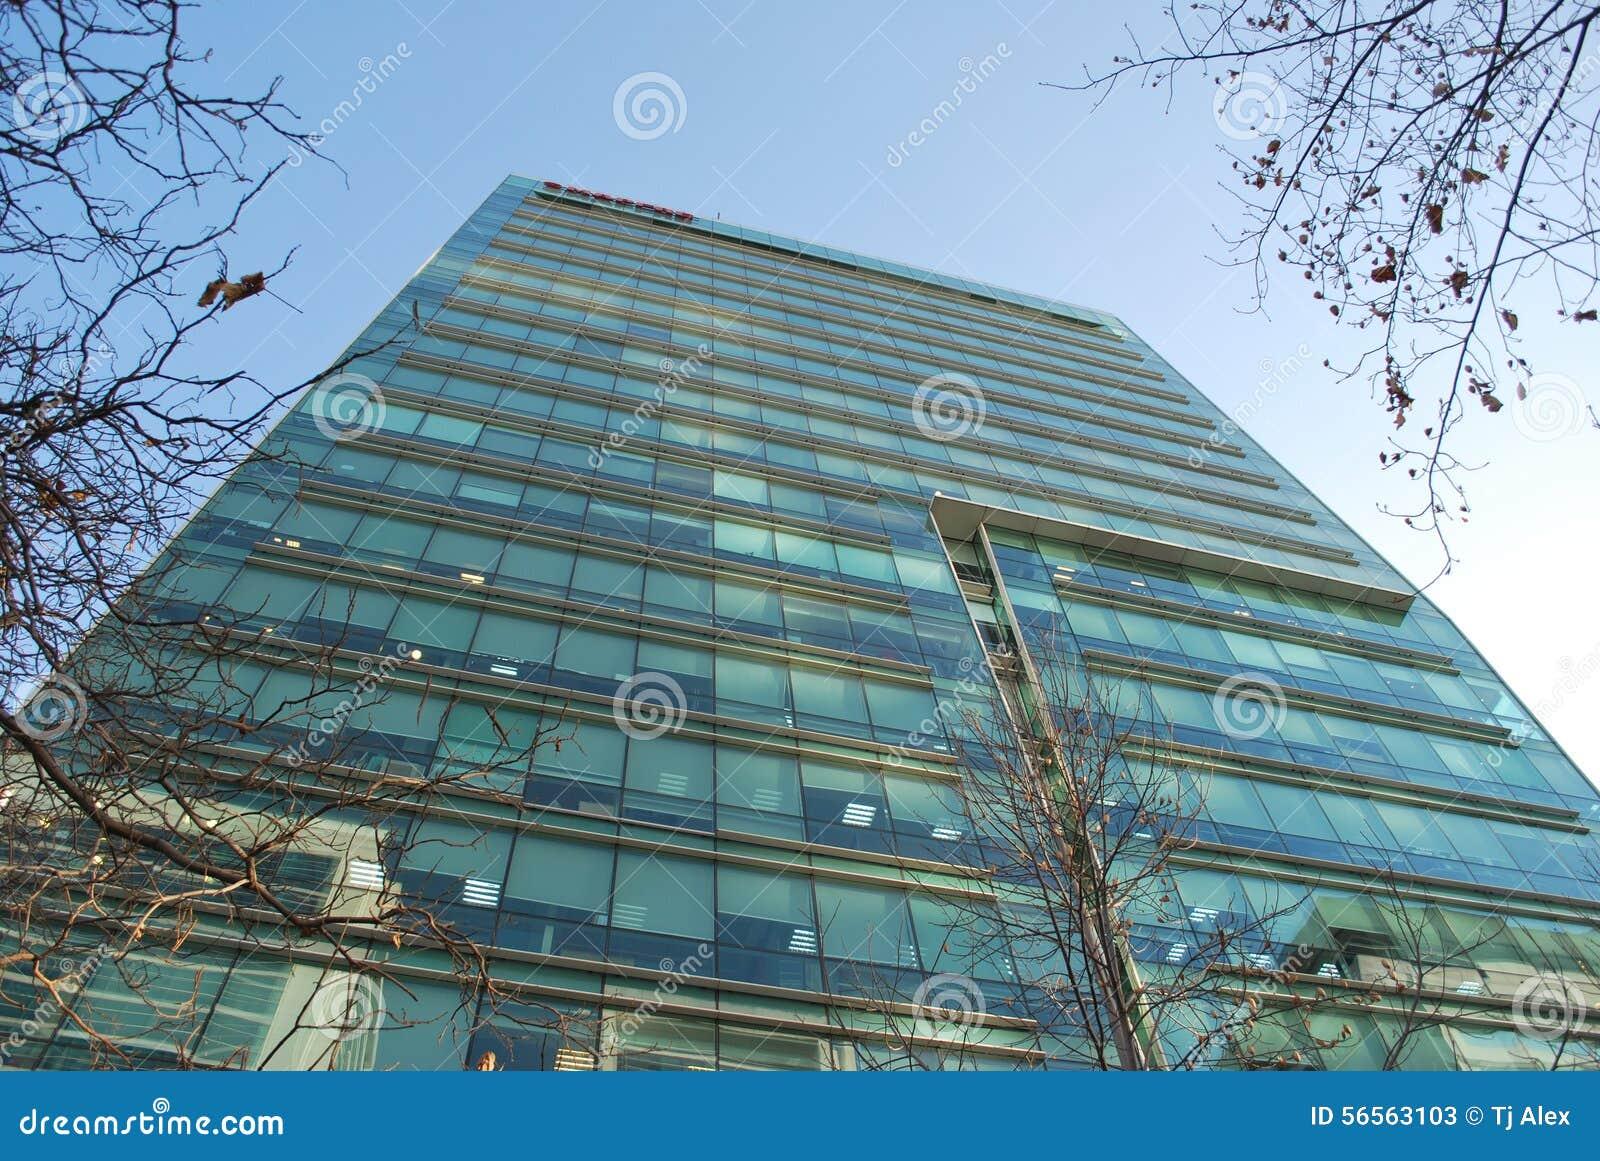 Download Καταπληκτικοί ουρανοξύστες στο Σαντιάγο, Χιλή Στοκ Εικόνα - εικόνα από ορόσημο, σύννεφα: 56563103